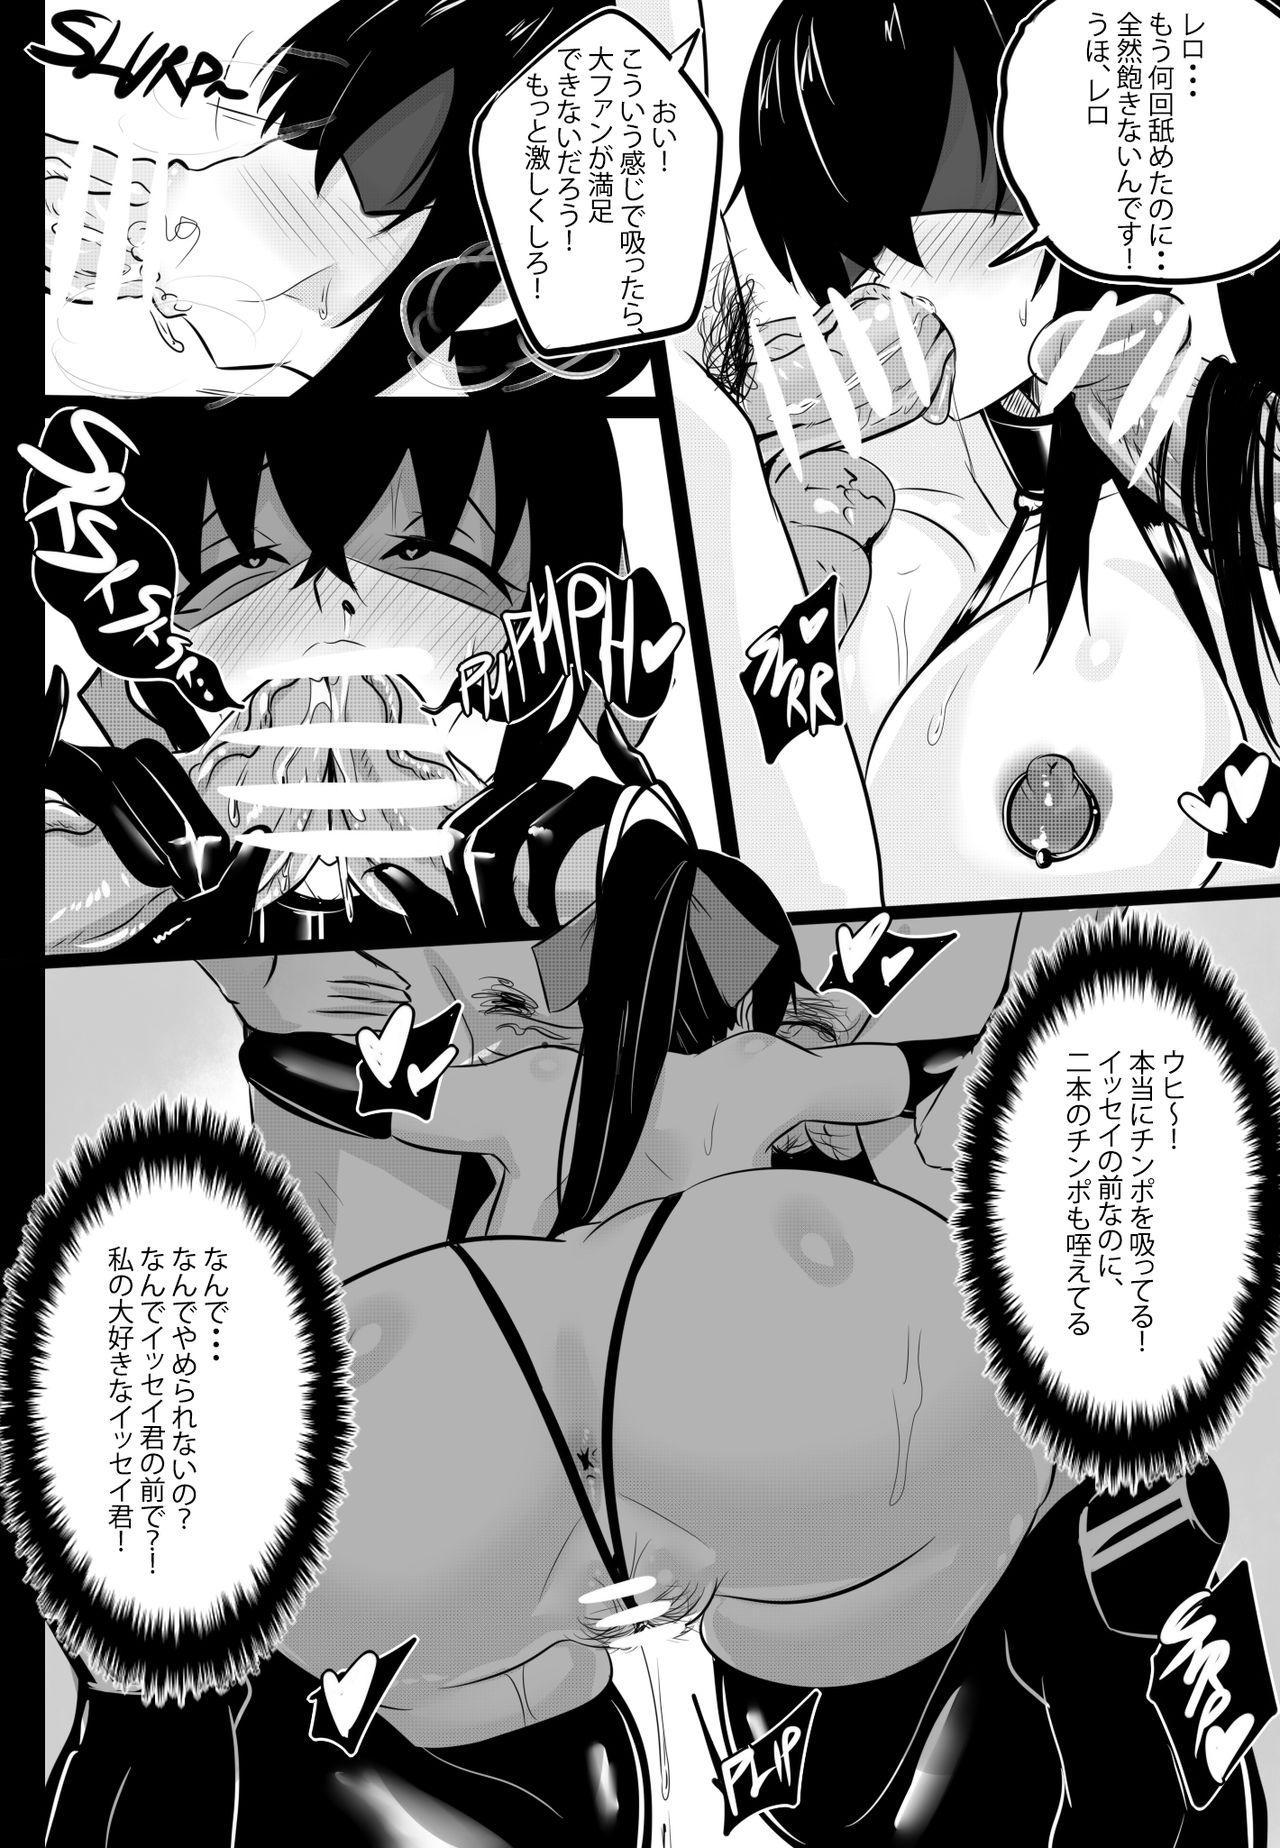 [Merkonig] B-Trayal 22-4 Akeno (Highschool DxD) 6